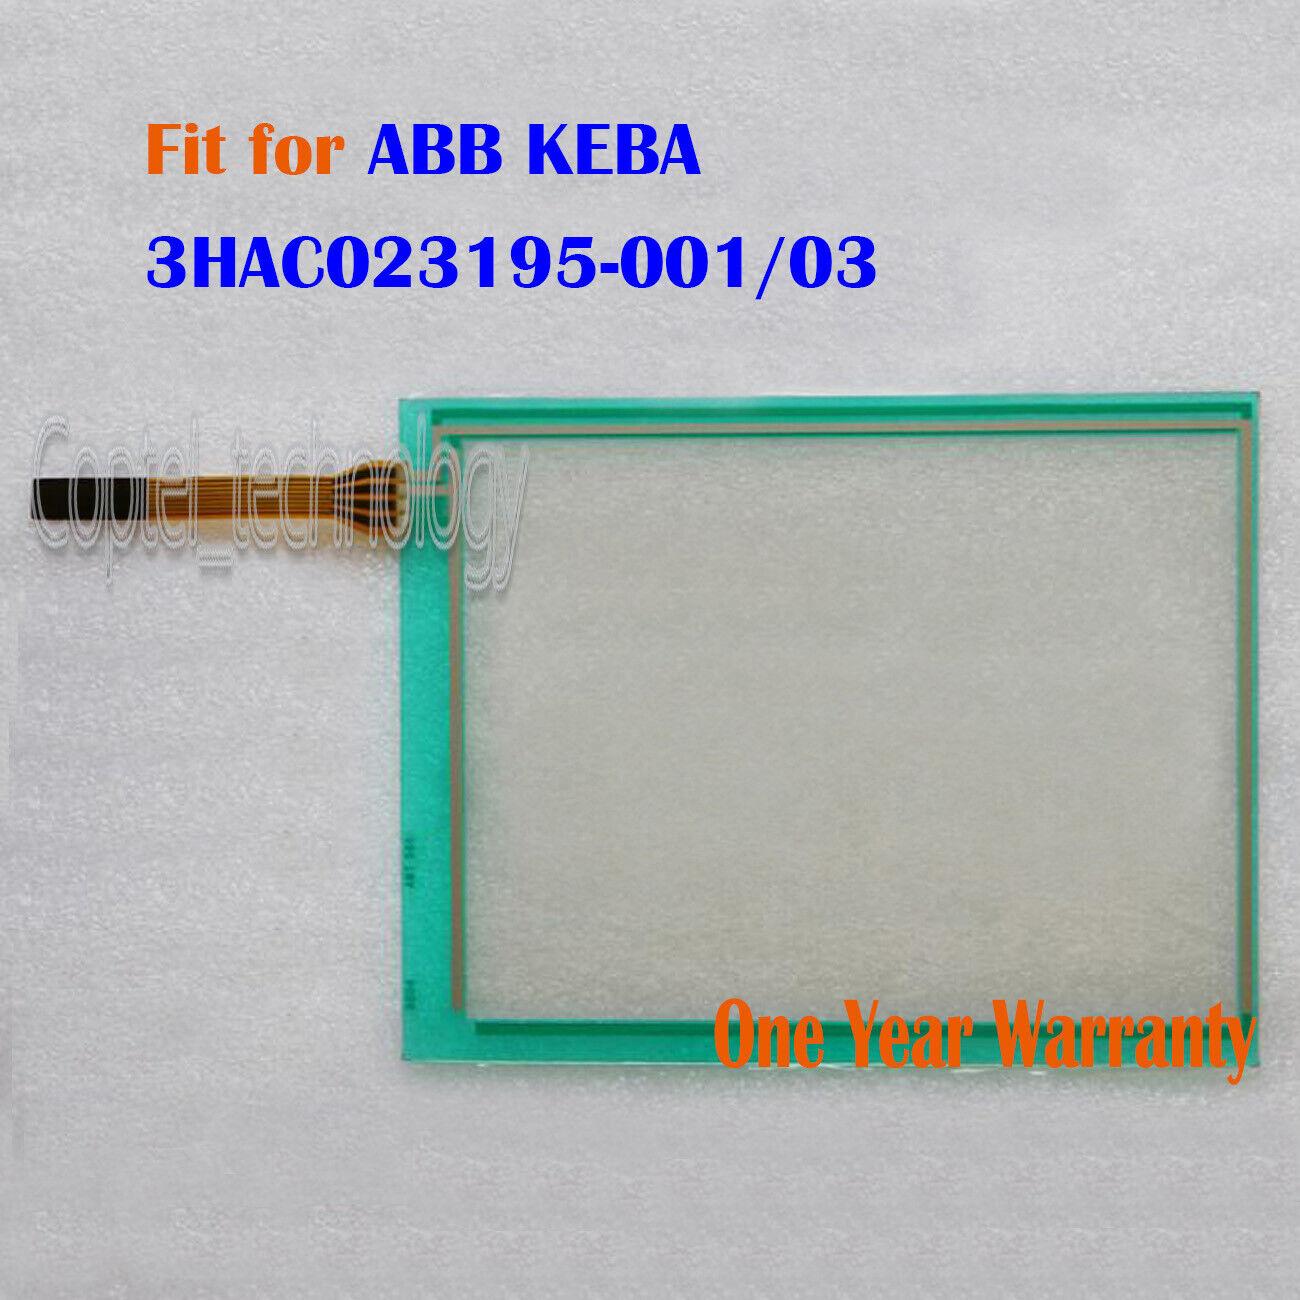 Touch Screen Glass for ABB KEBA 3HAC023195-001  03 Teach Pendant Unit -2 16  64